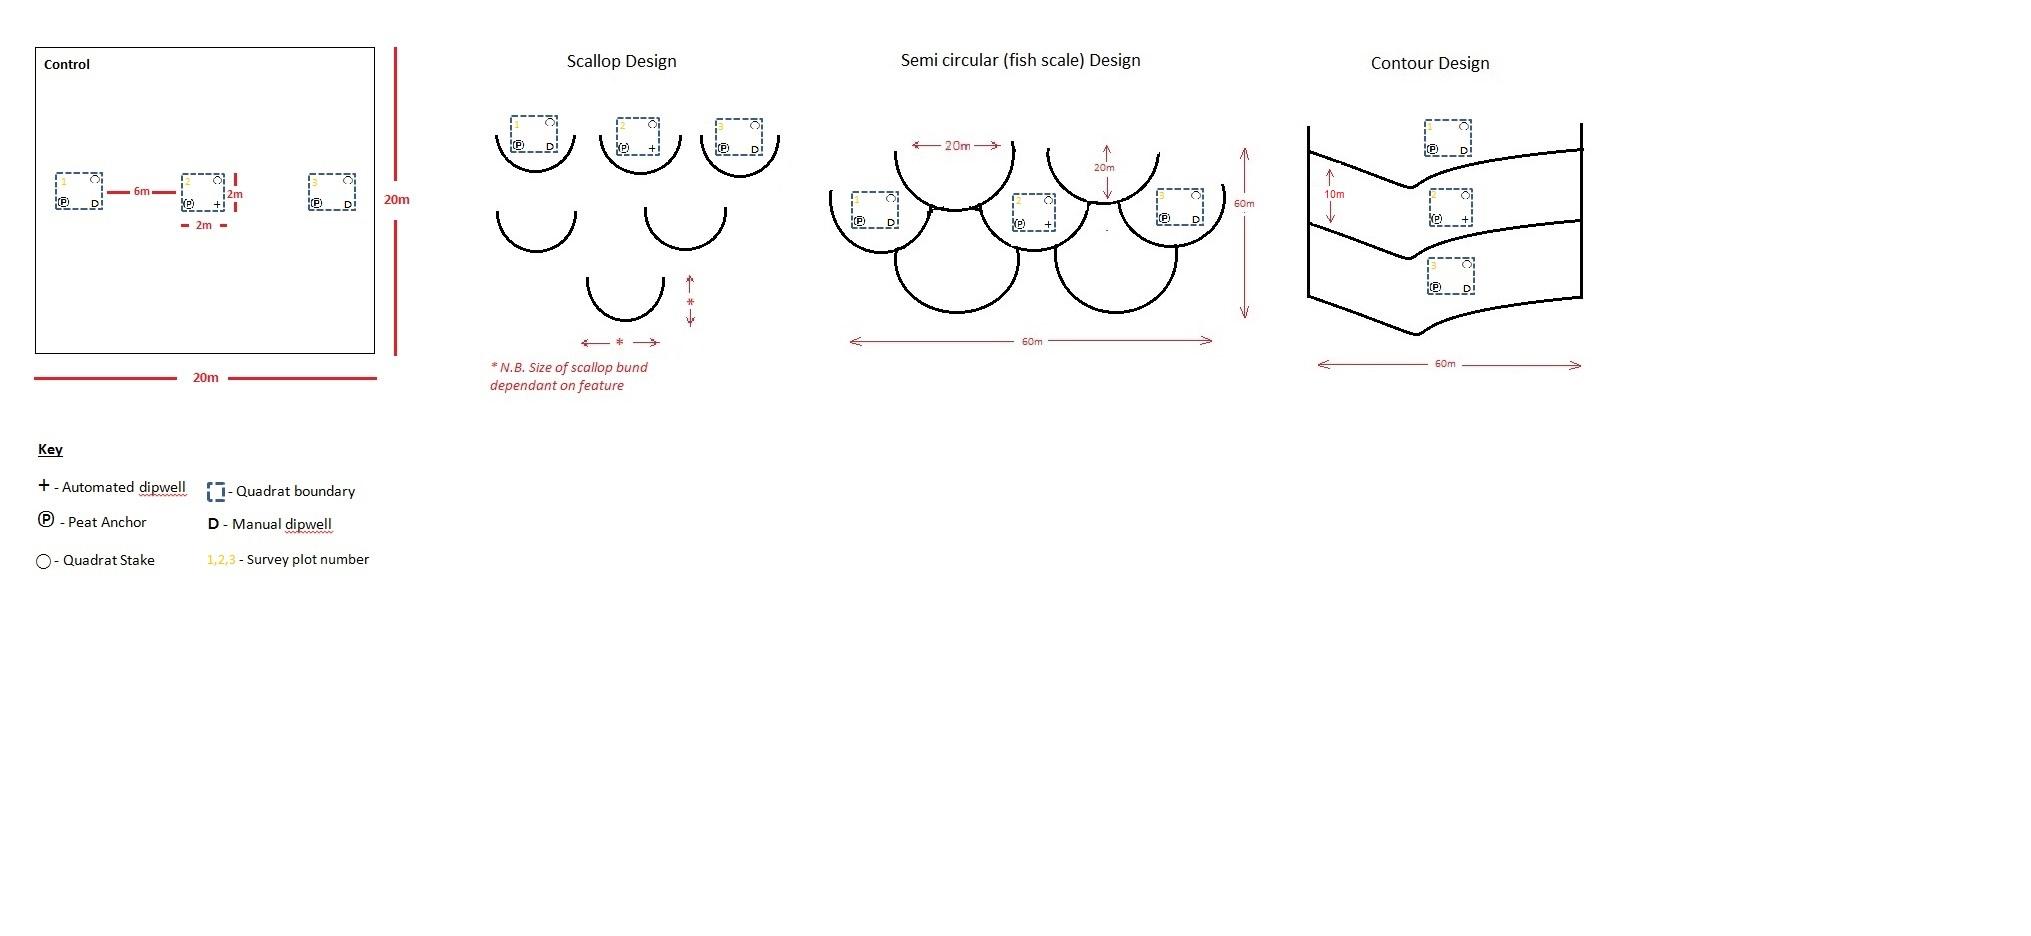 Diagram showing the different bunds designs